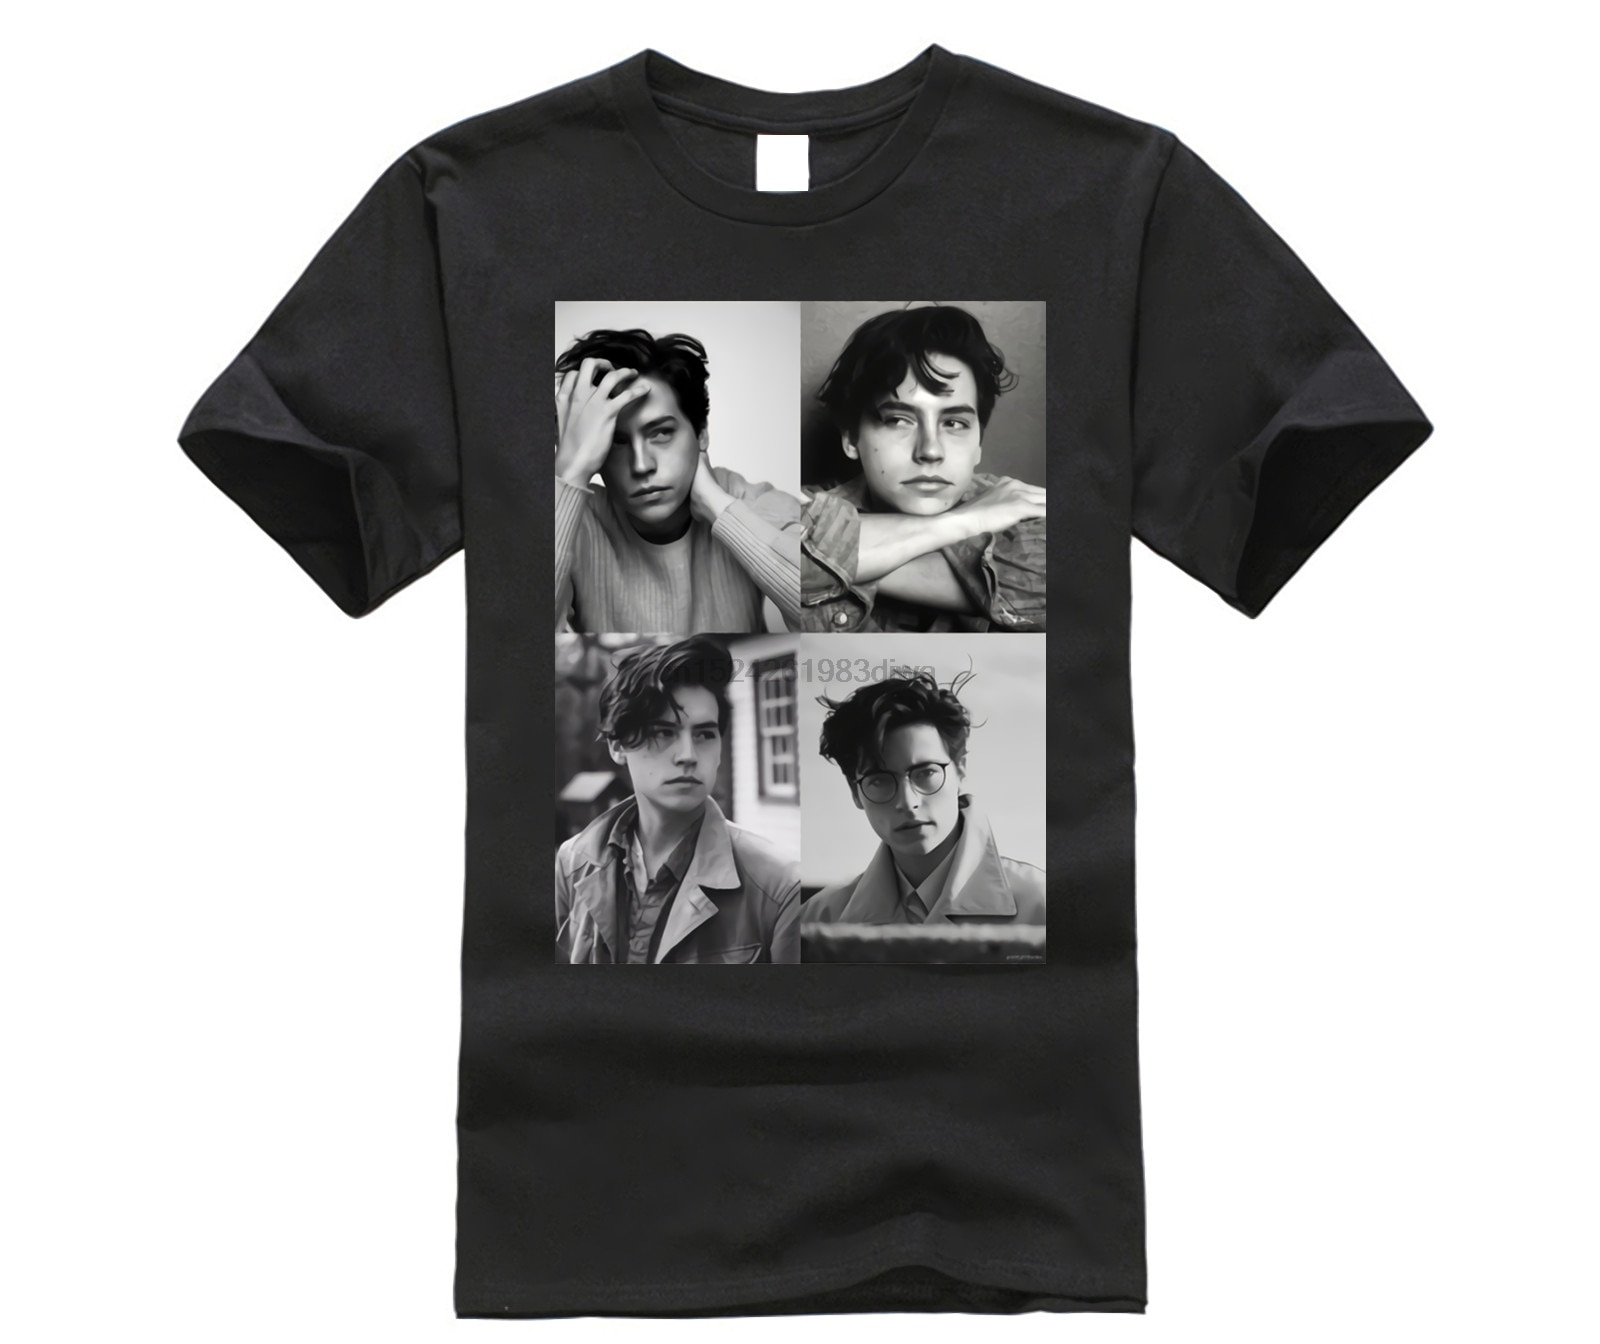 Cole Sprouse camiseta Cole Sprouse Collage B W Camiseta Hombre algodón camiseta clásica impresa divertida talla grande corto -Camiseta de manga